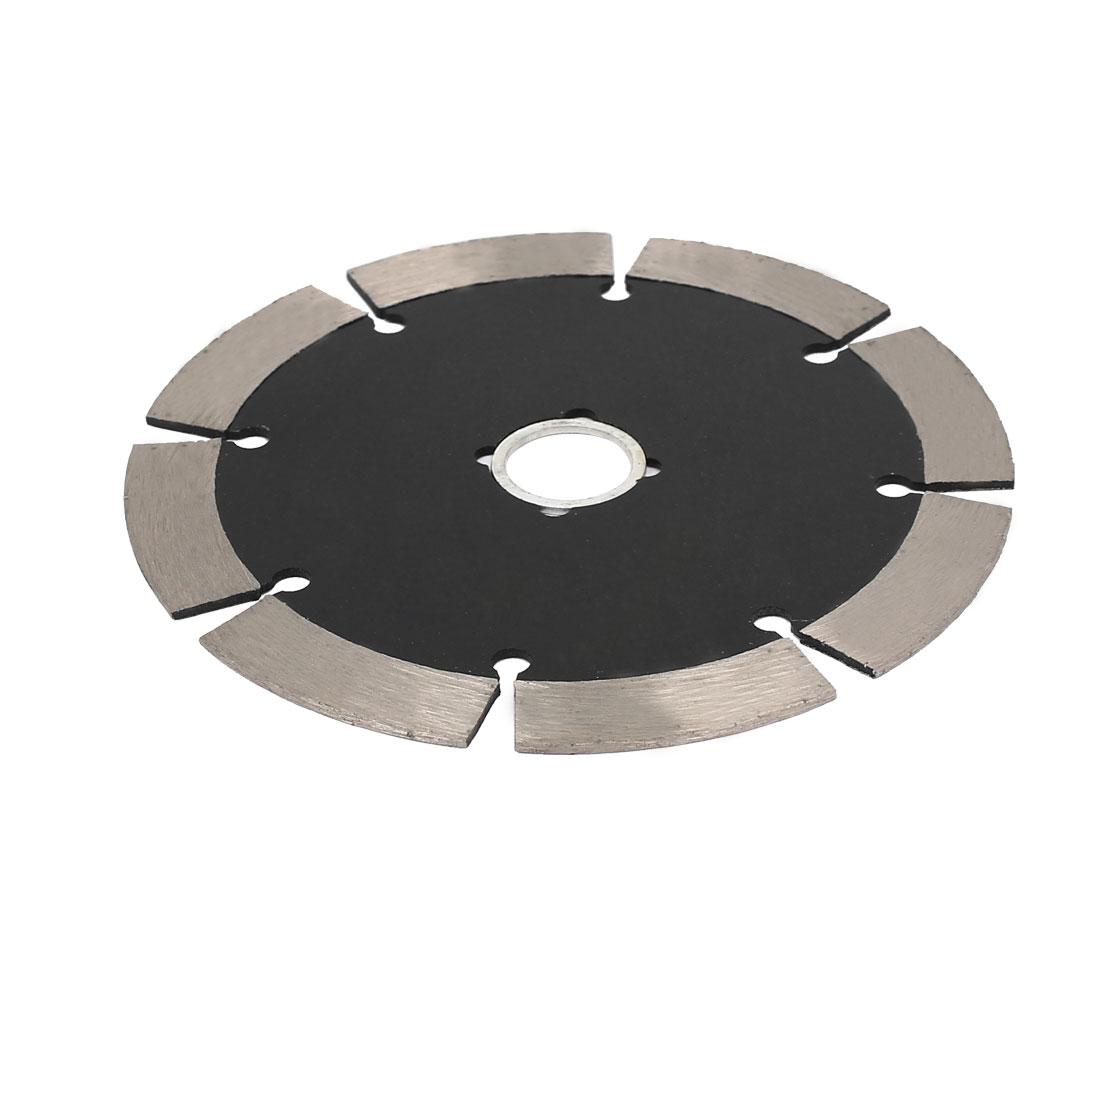 114mm Dia 1.8mm Thickness Dry or Wet Cutting Segmented Diamond Saw Blade Black